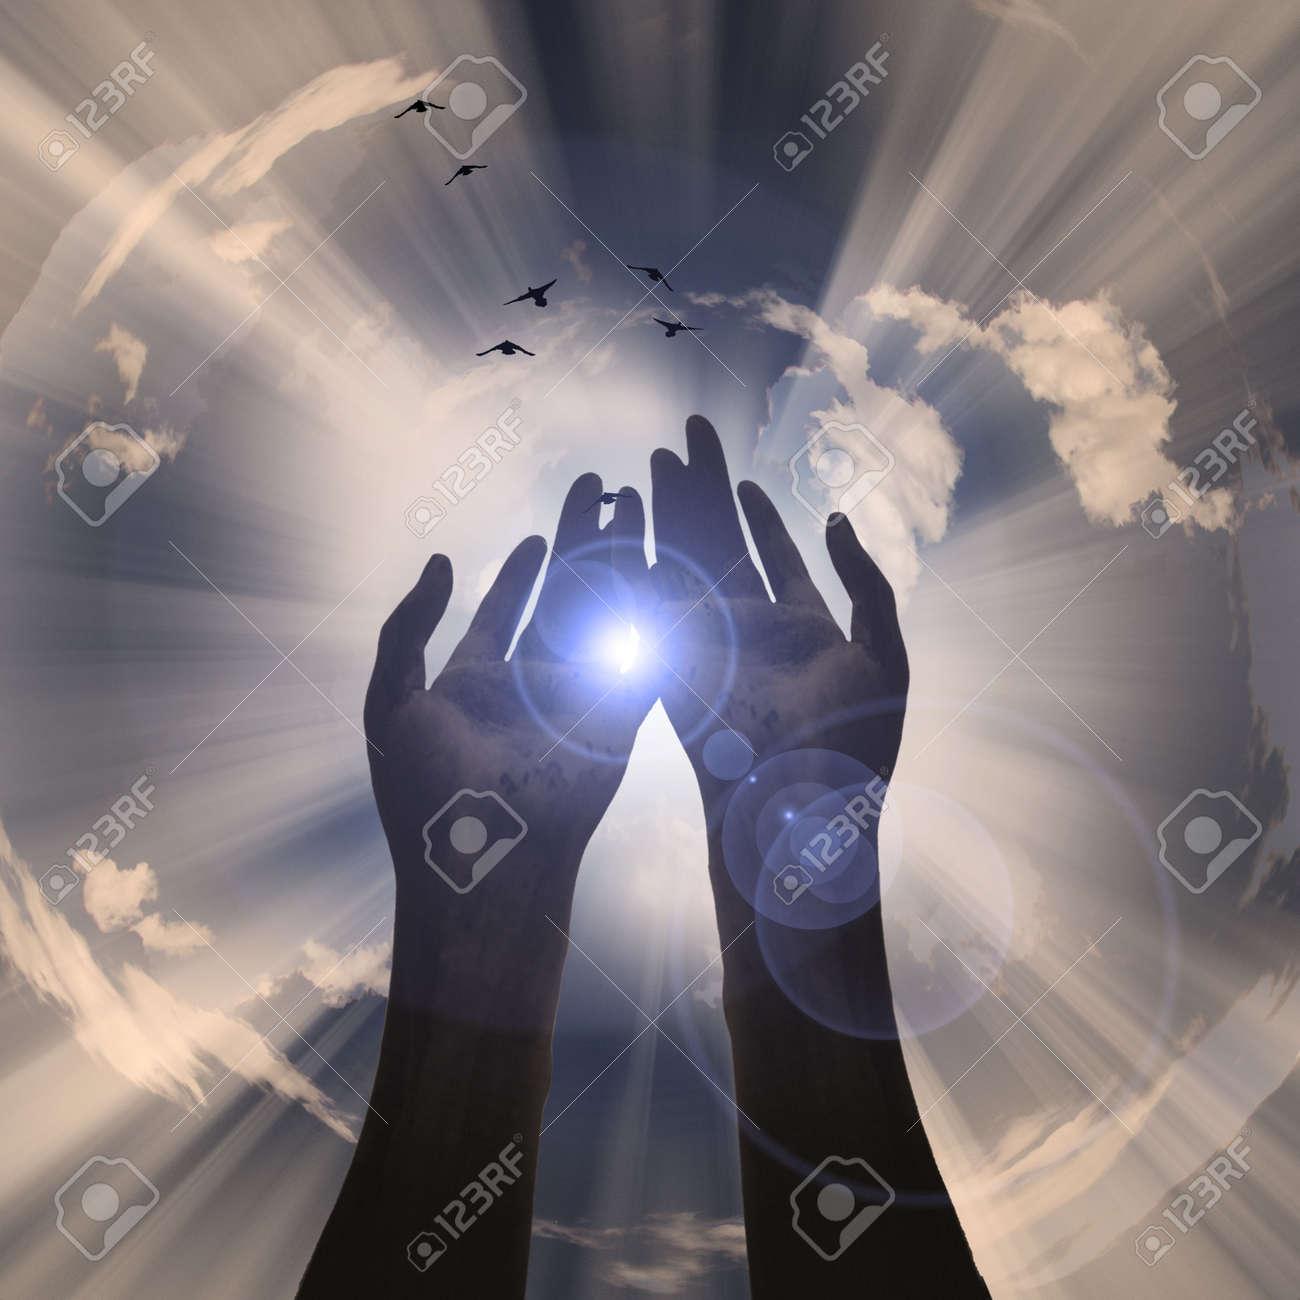 Hands reveal light Stock Photo - 6144267